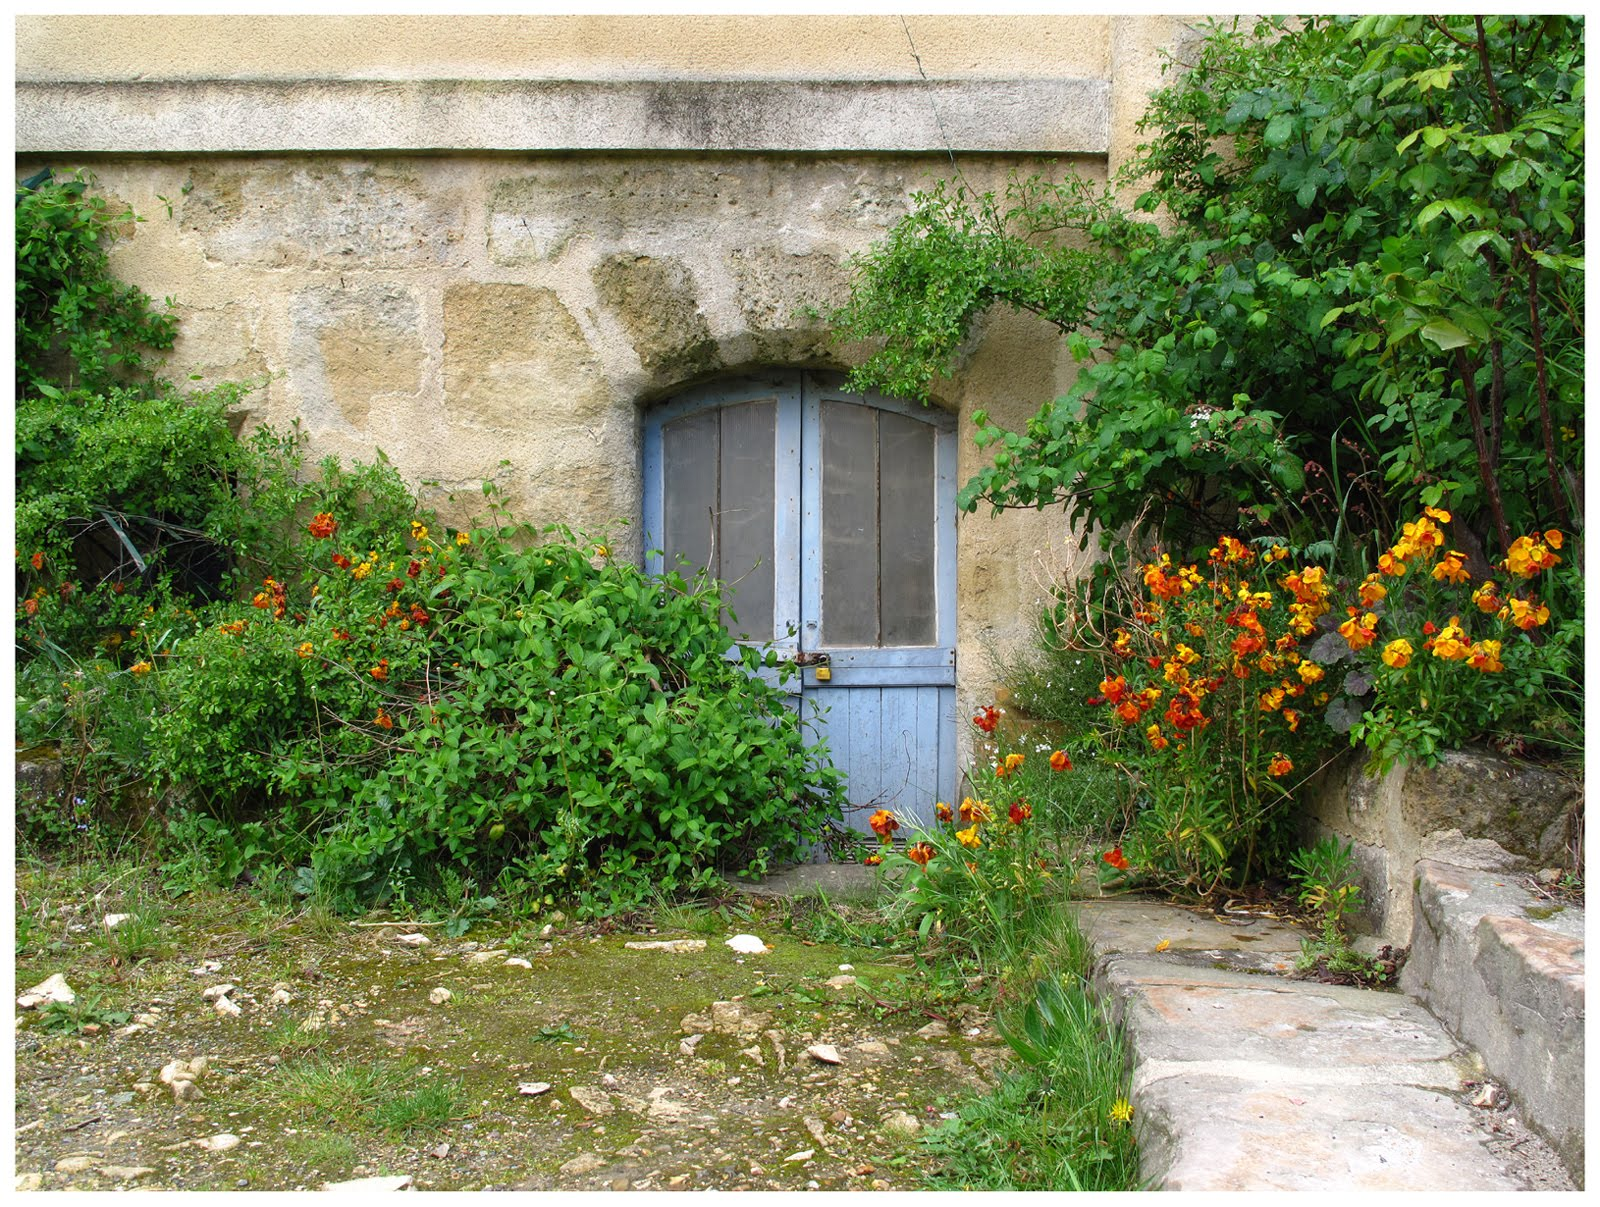 Cergipontin la porte de cave the basement door for Porte cave